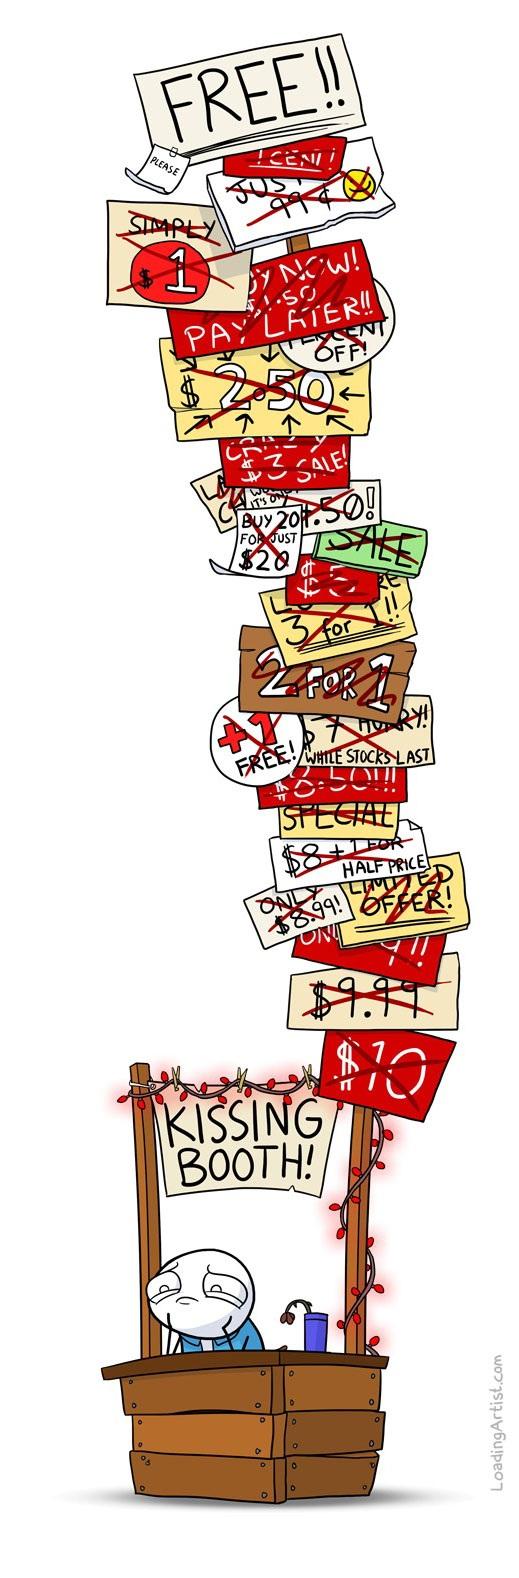 funny-Valentines-Day-kiss-drawing.jpg (208 KB)